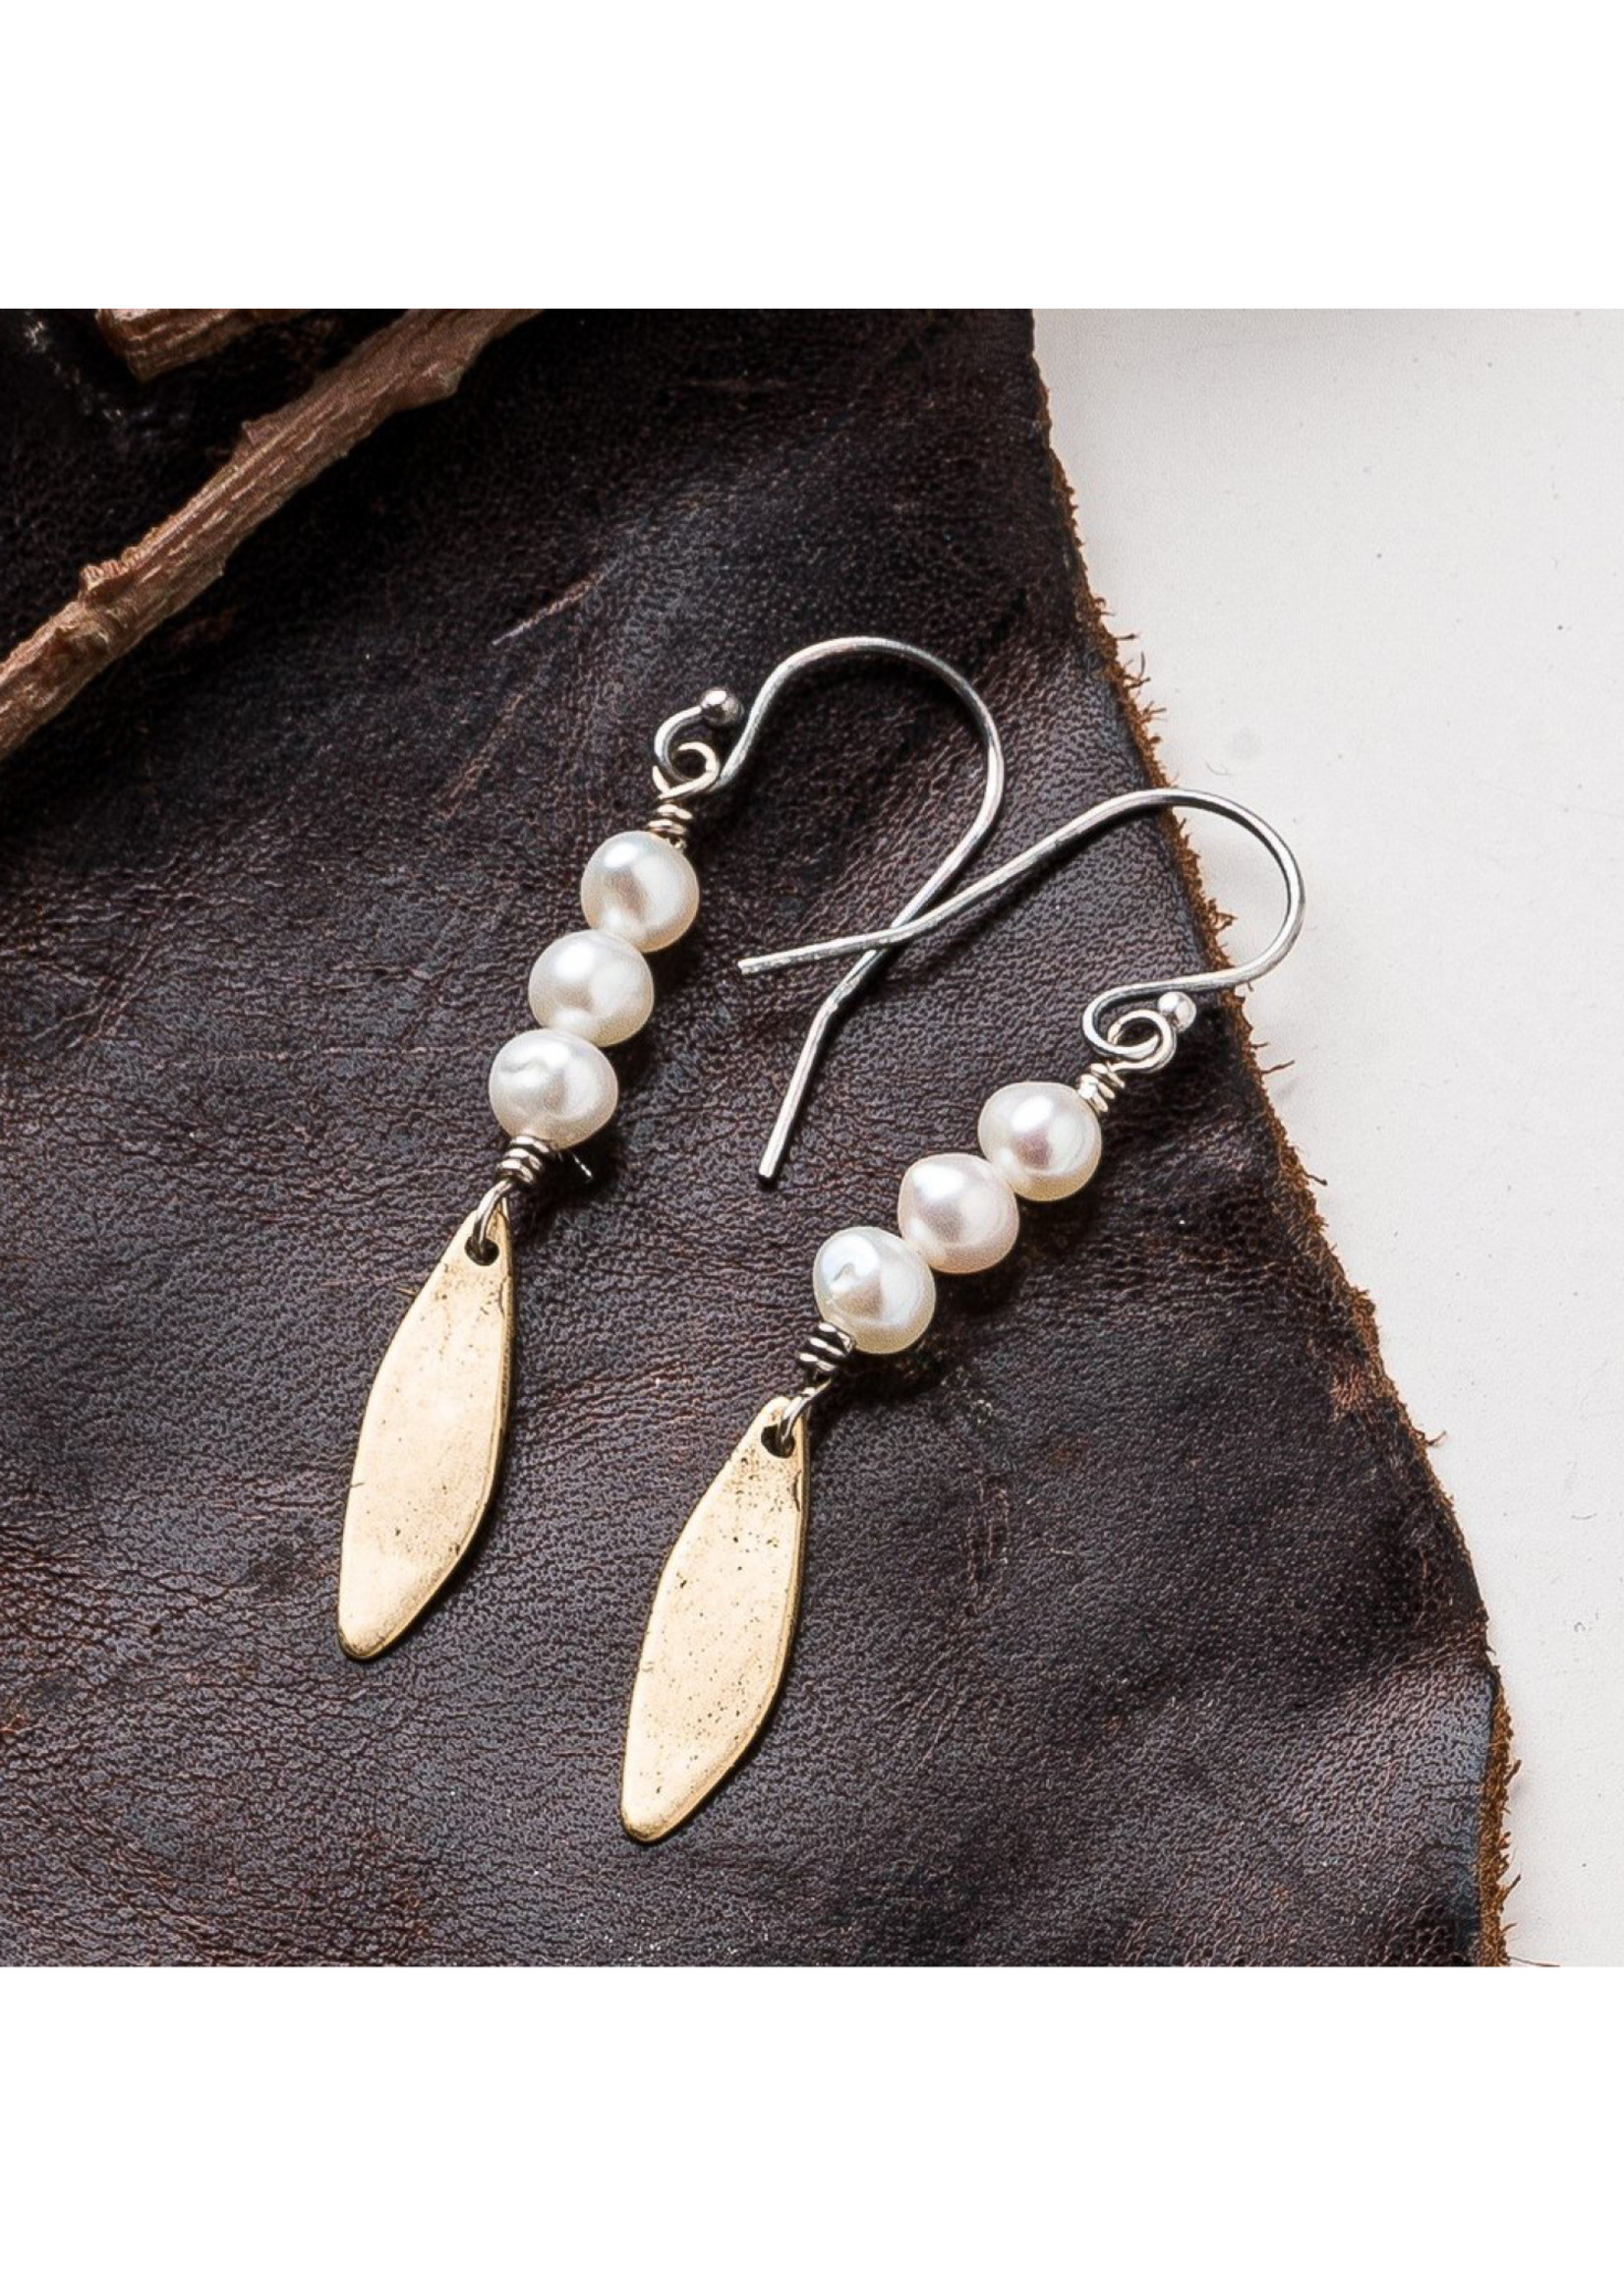 Original Hardware Gemstone Mini Allure Earrings